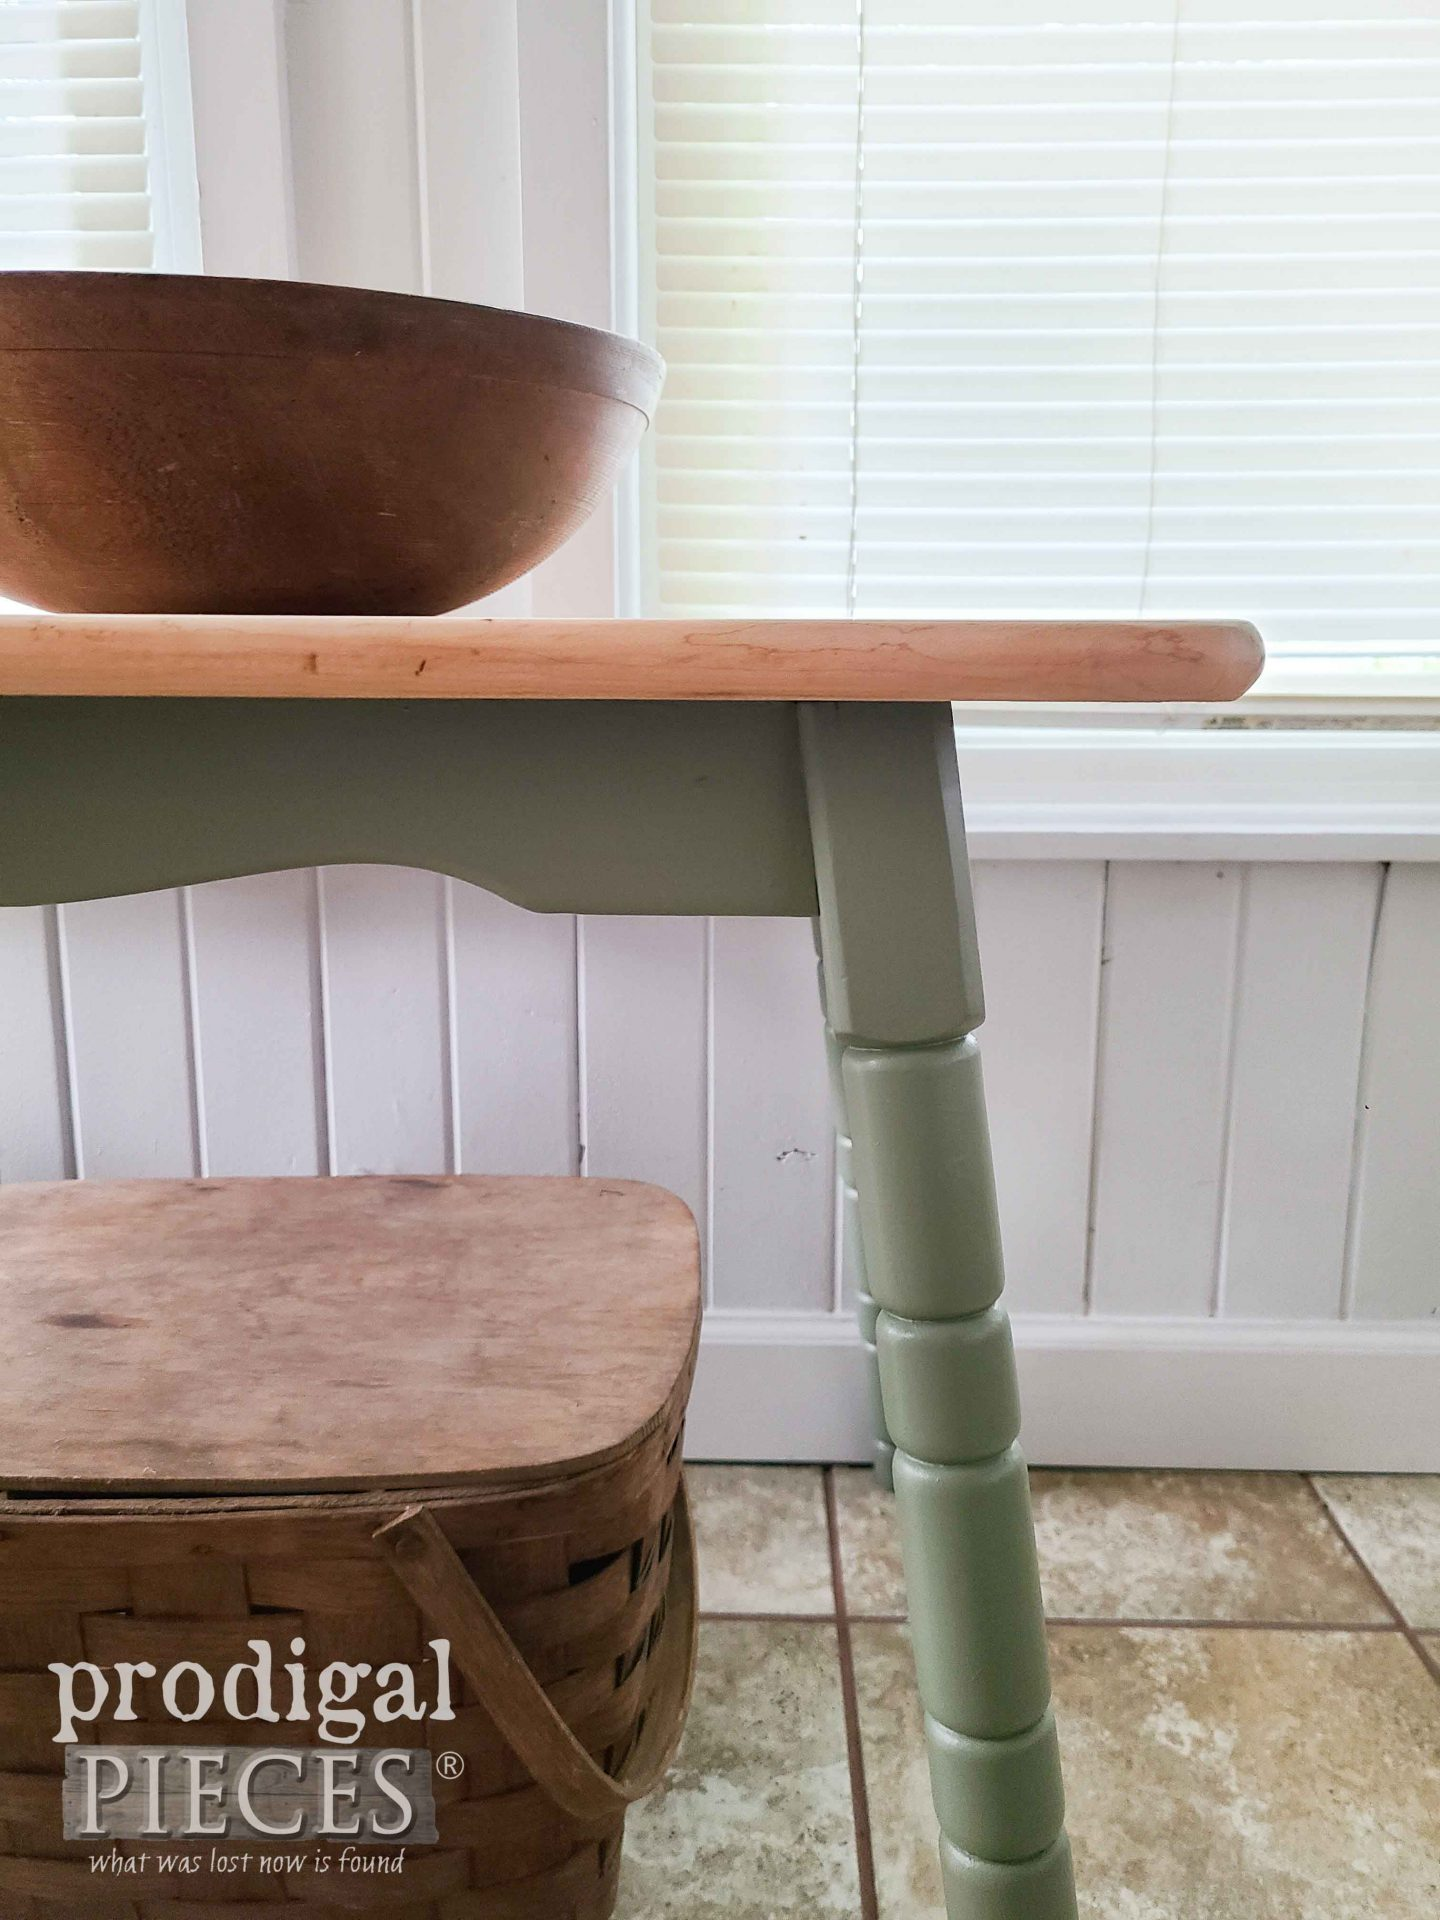 Mini Farmhouse Table Closeup by Prodigal Pieces   prodigalpieces.com #prodigalpieces #furniture #rustic #cottage